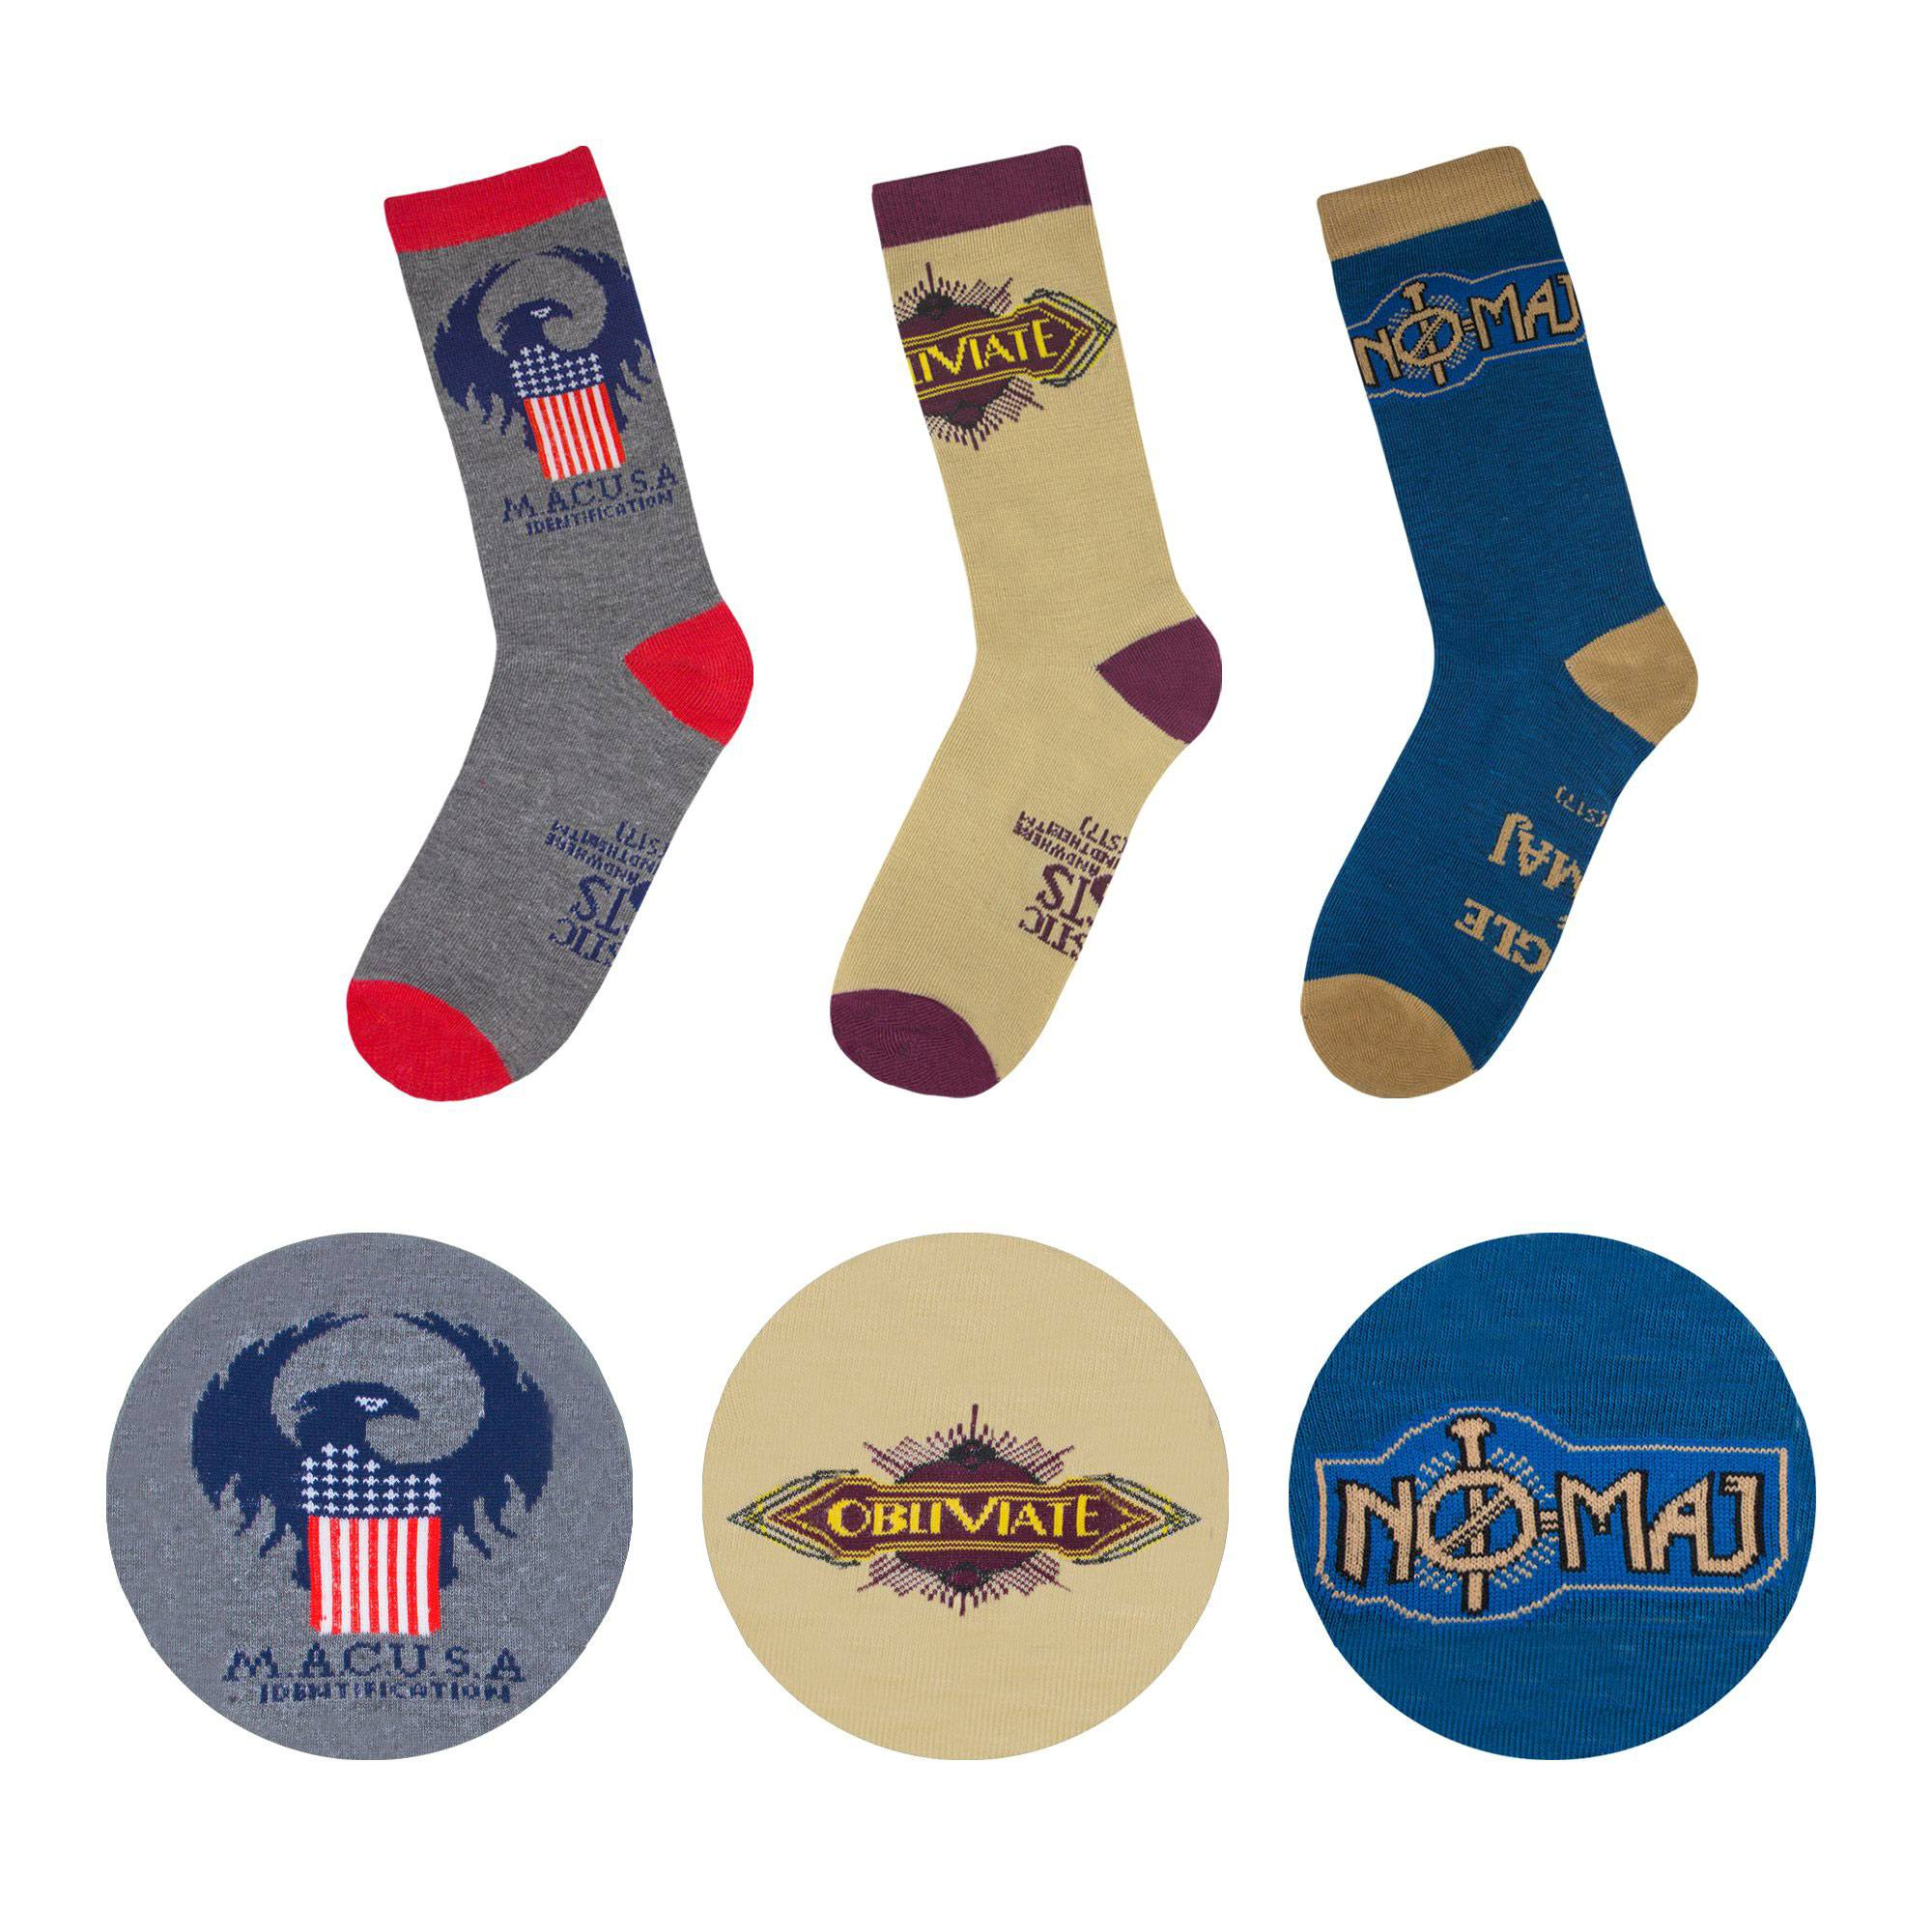 Fantastic Beasts Socks 3-Pack MACUSA